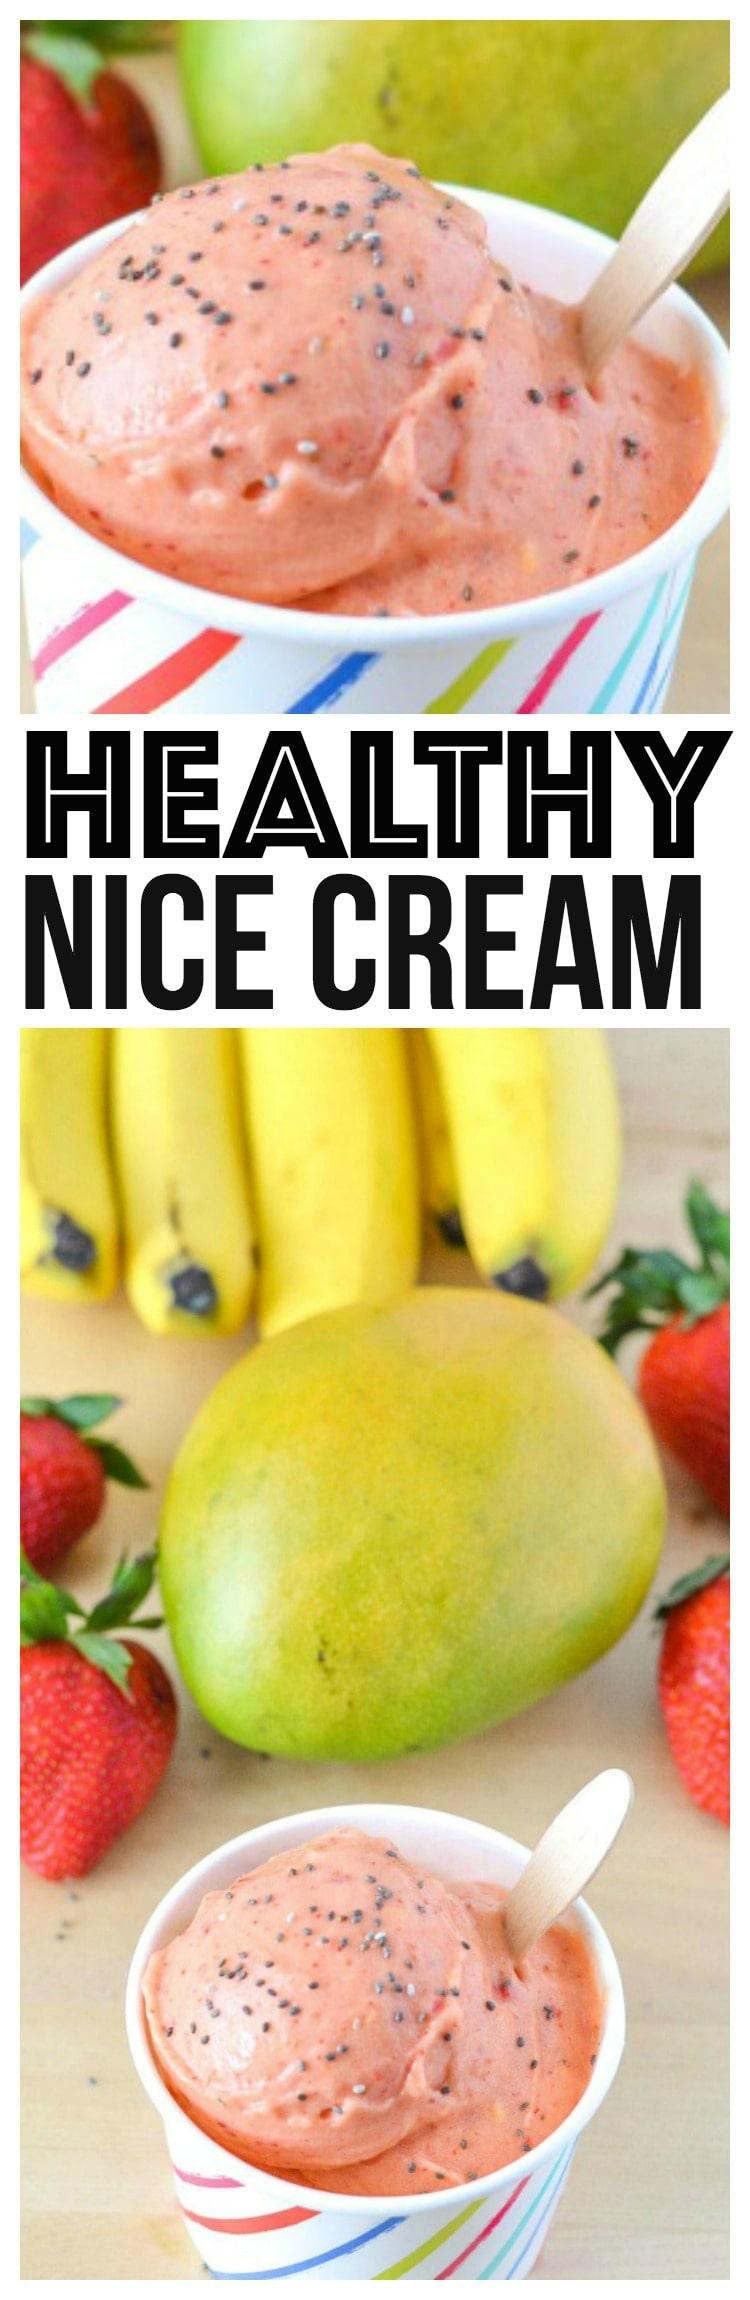 strawberry mango banana smoothie turned nice cream recipe vegan nice cream recipes are healthy and nice cream recipes bananas are used most